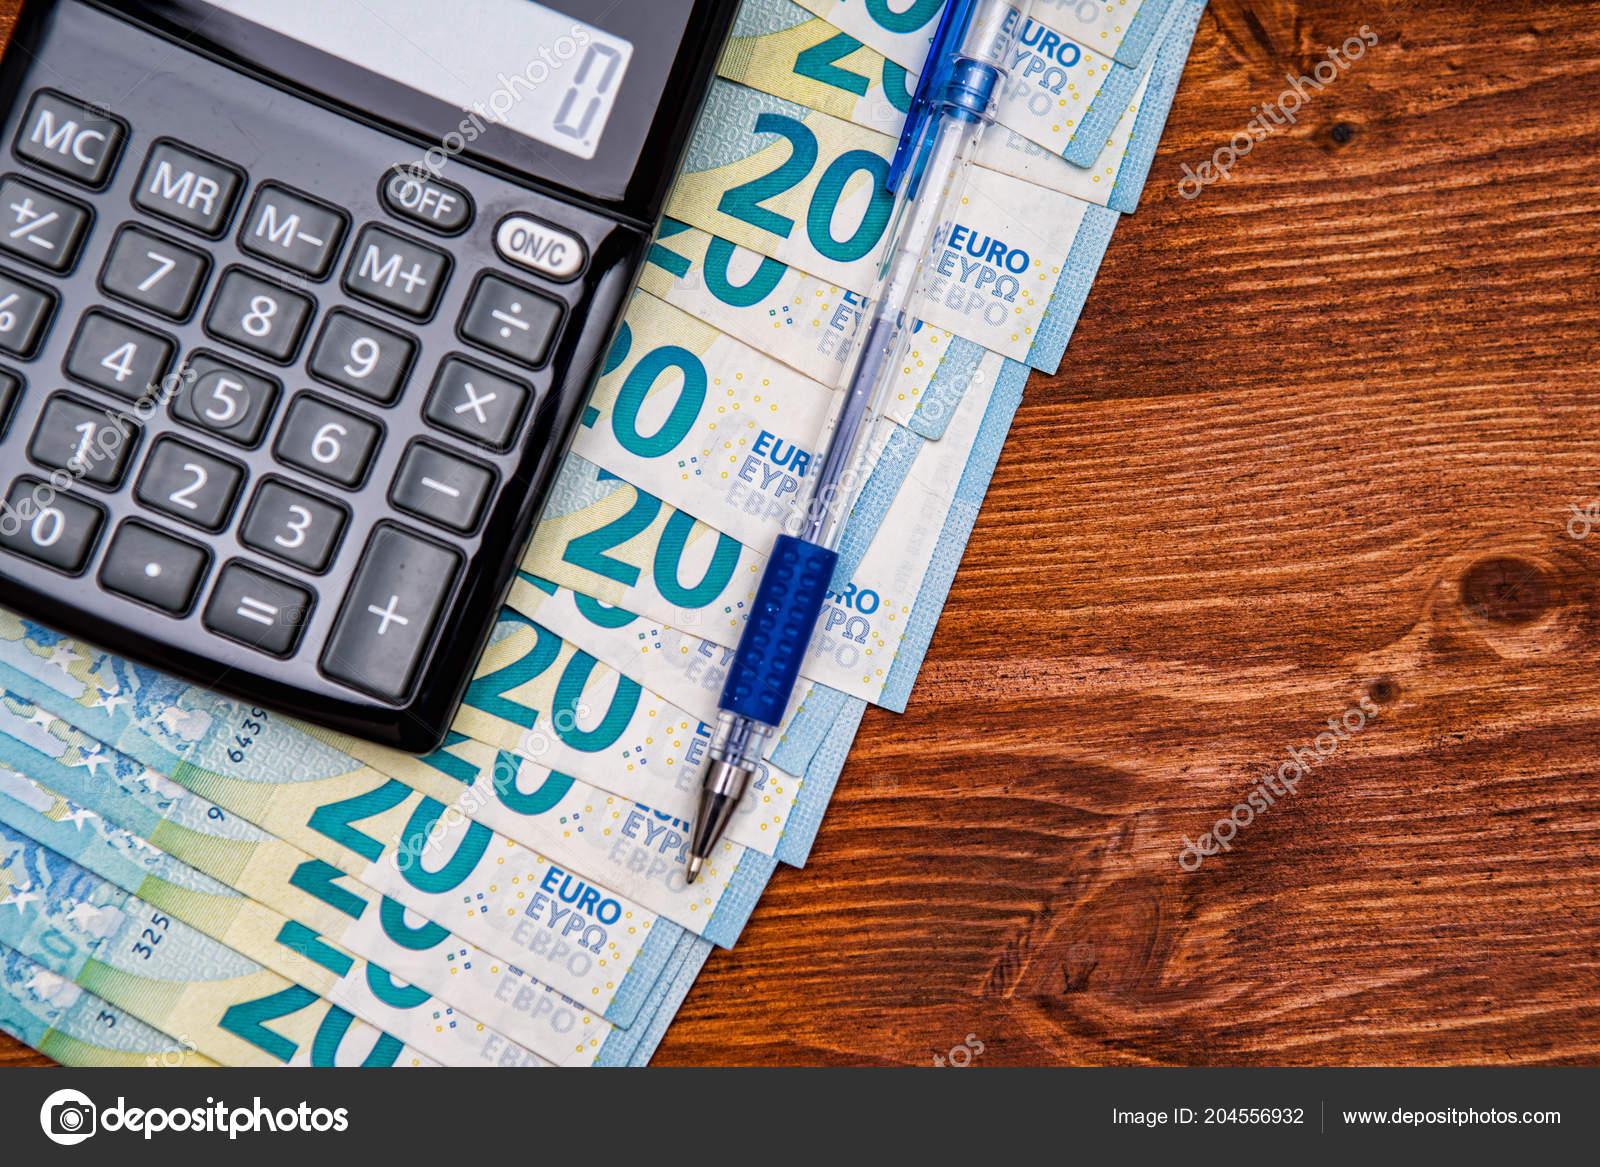 Financial Background Money Calculator Table Pen Stock Photo By C Kalnenko 204556932